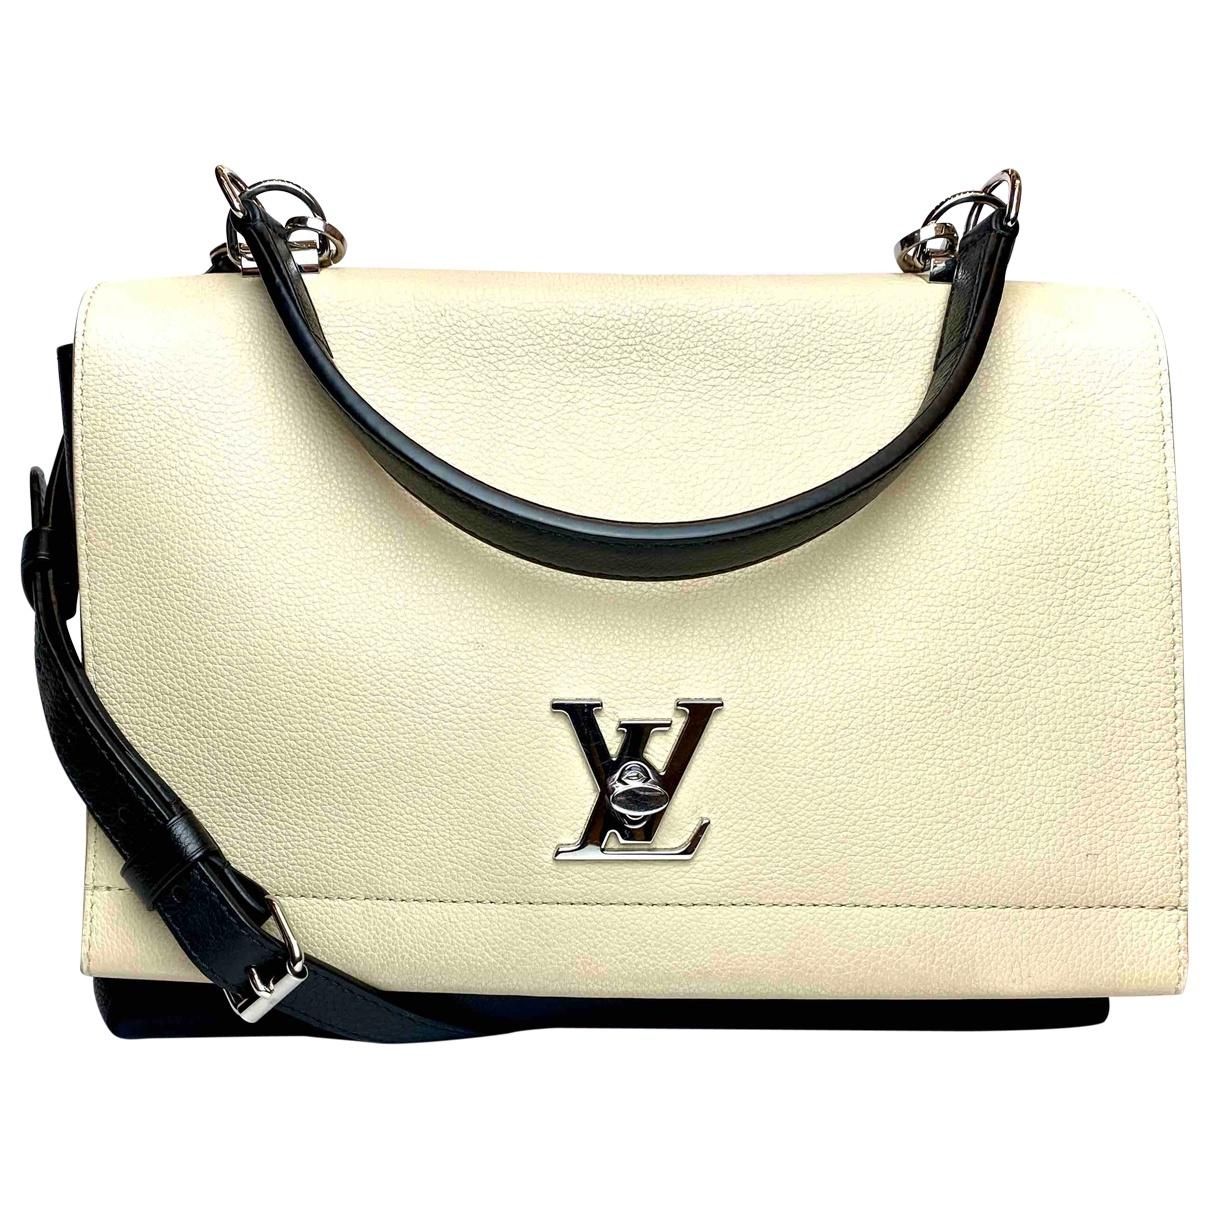 Bolso  Lockme de Cuero Louis Vuitton